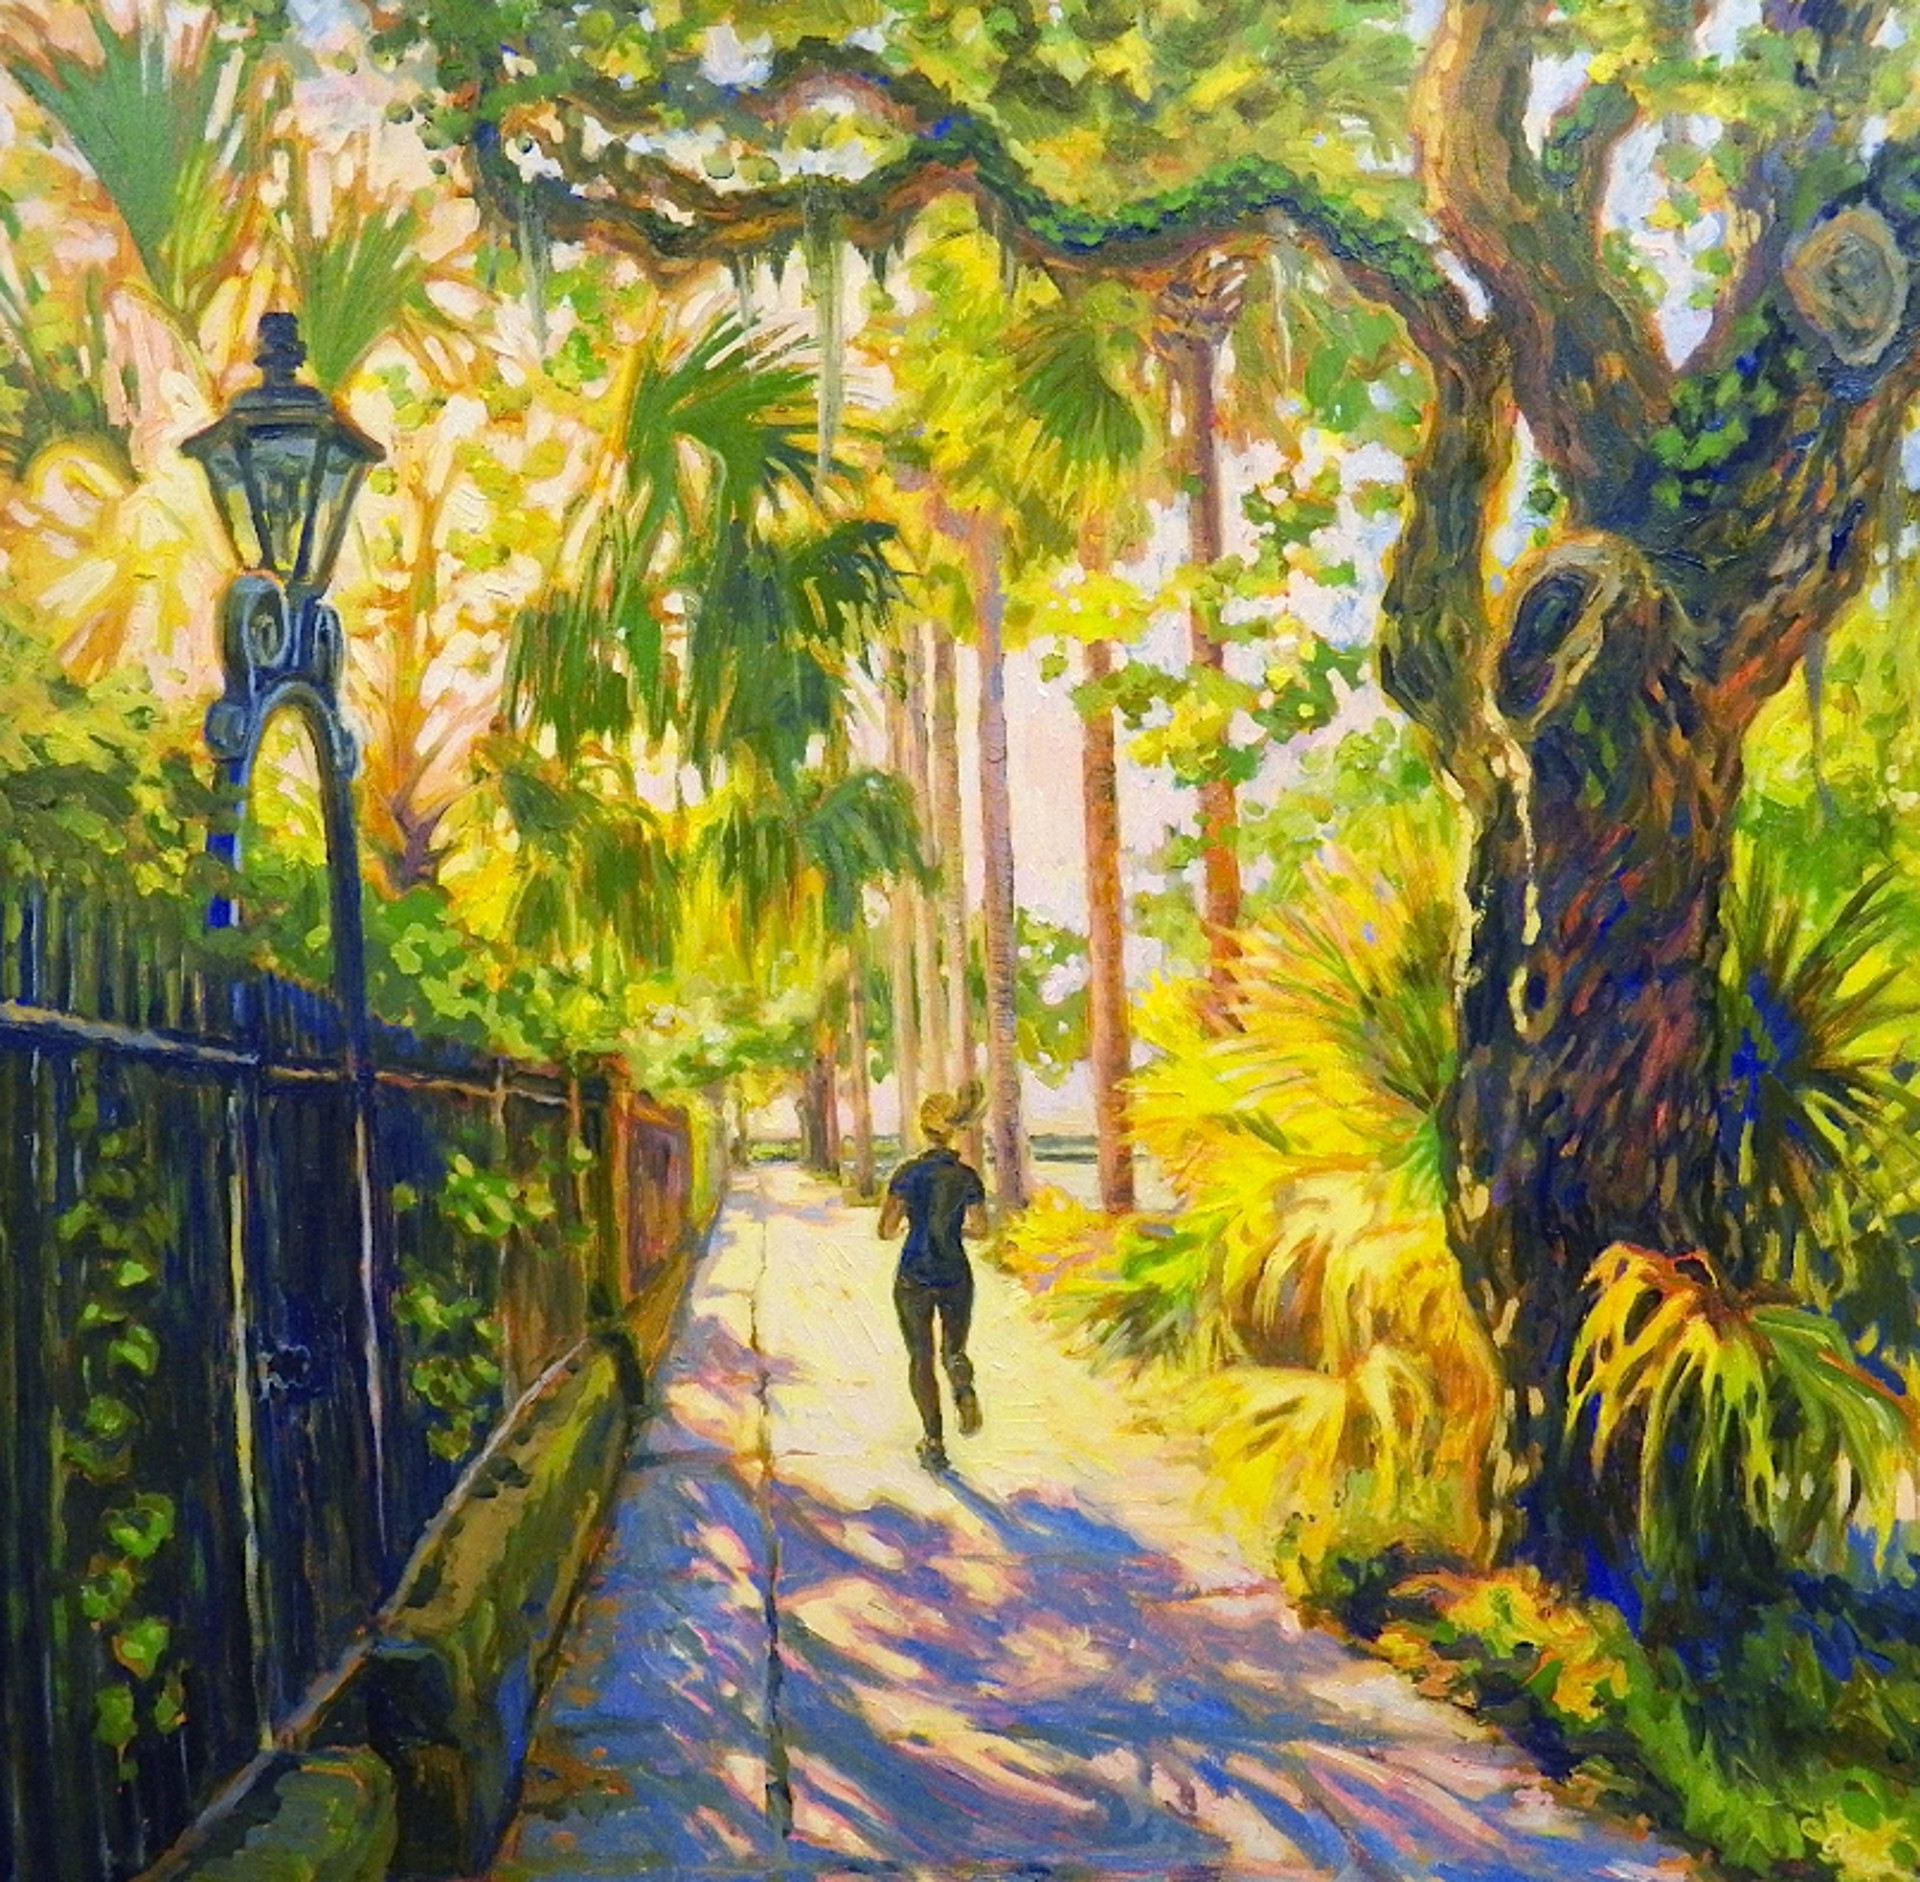 Morning Run by Olessia Maximenko